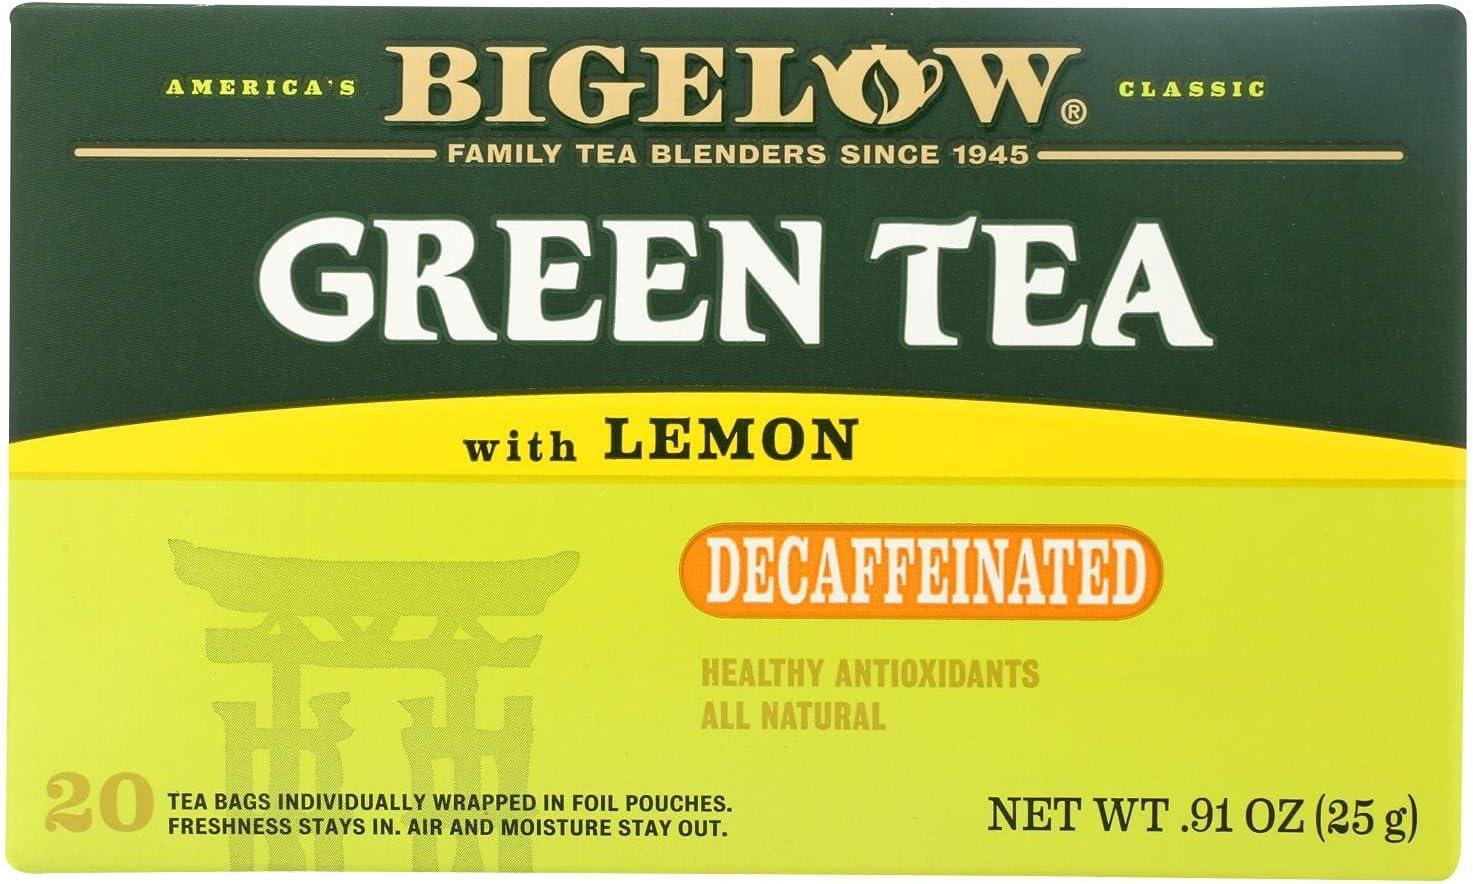 Bigelow Green Tea 激安☆超特価 with Lemon Decaf of 6 0.91 Pack OZ 激安卸販売新品